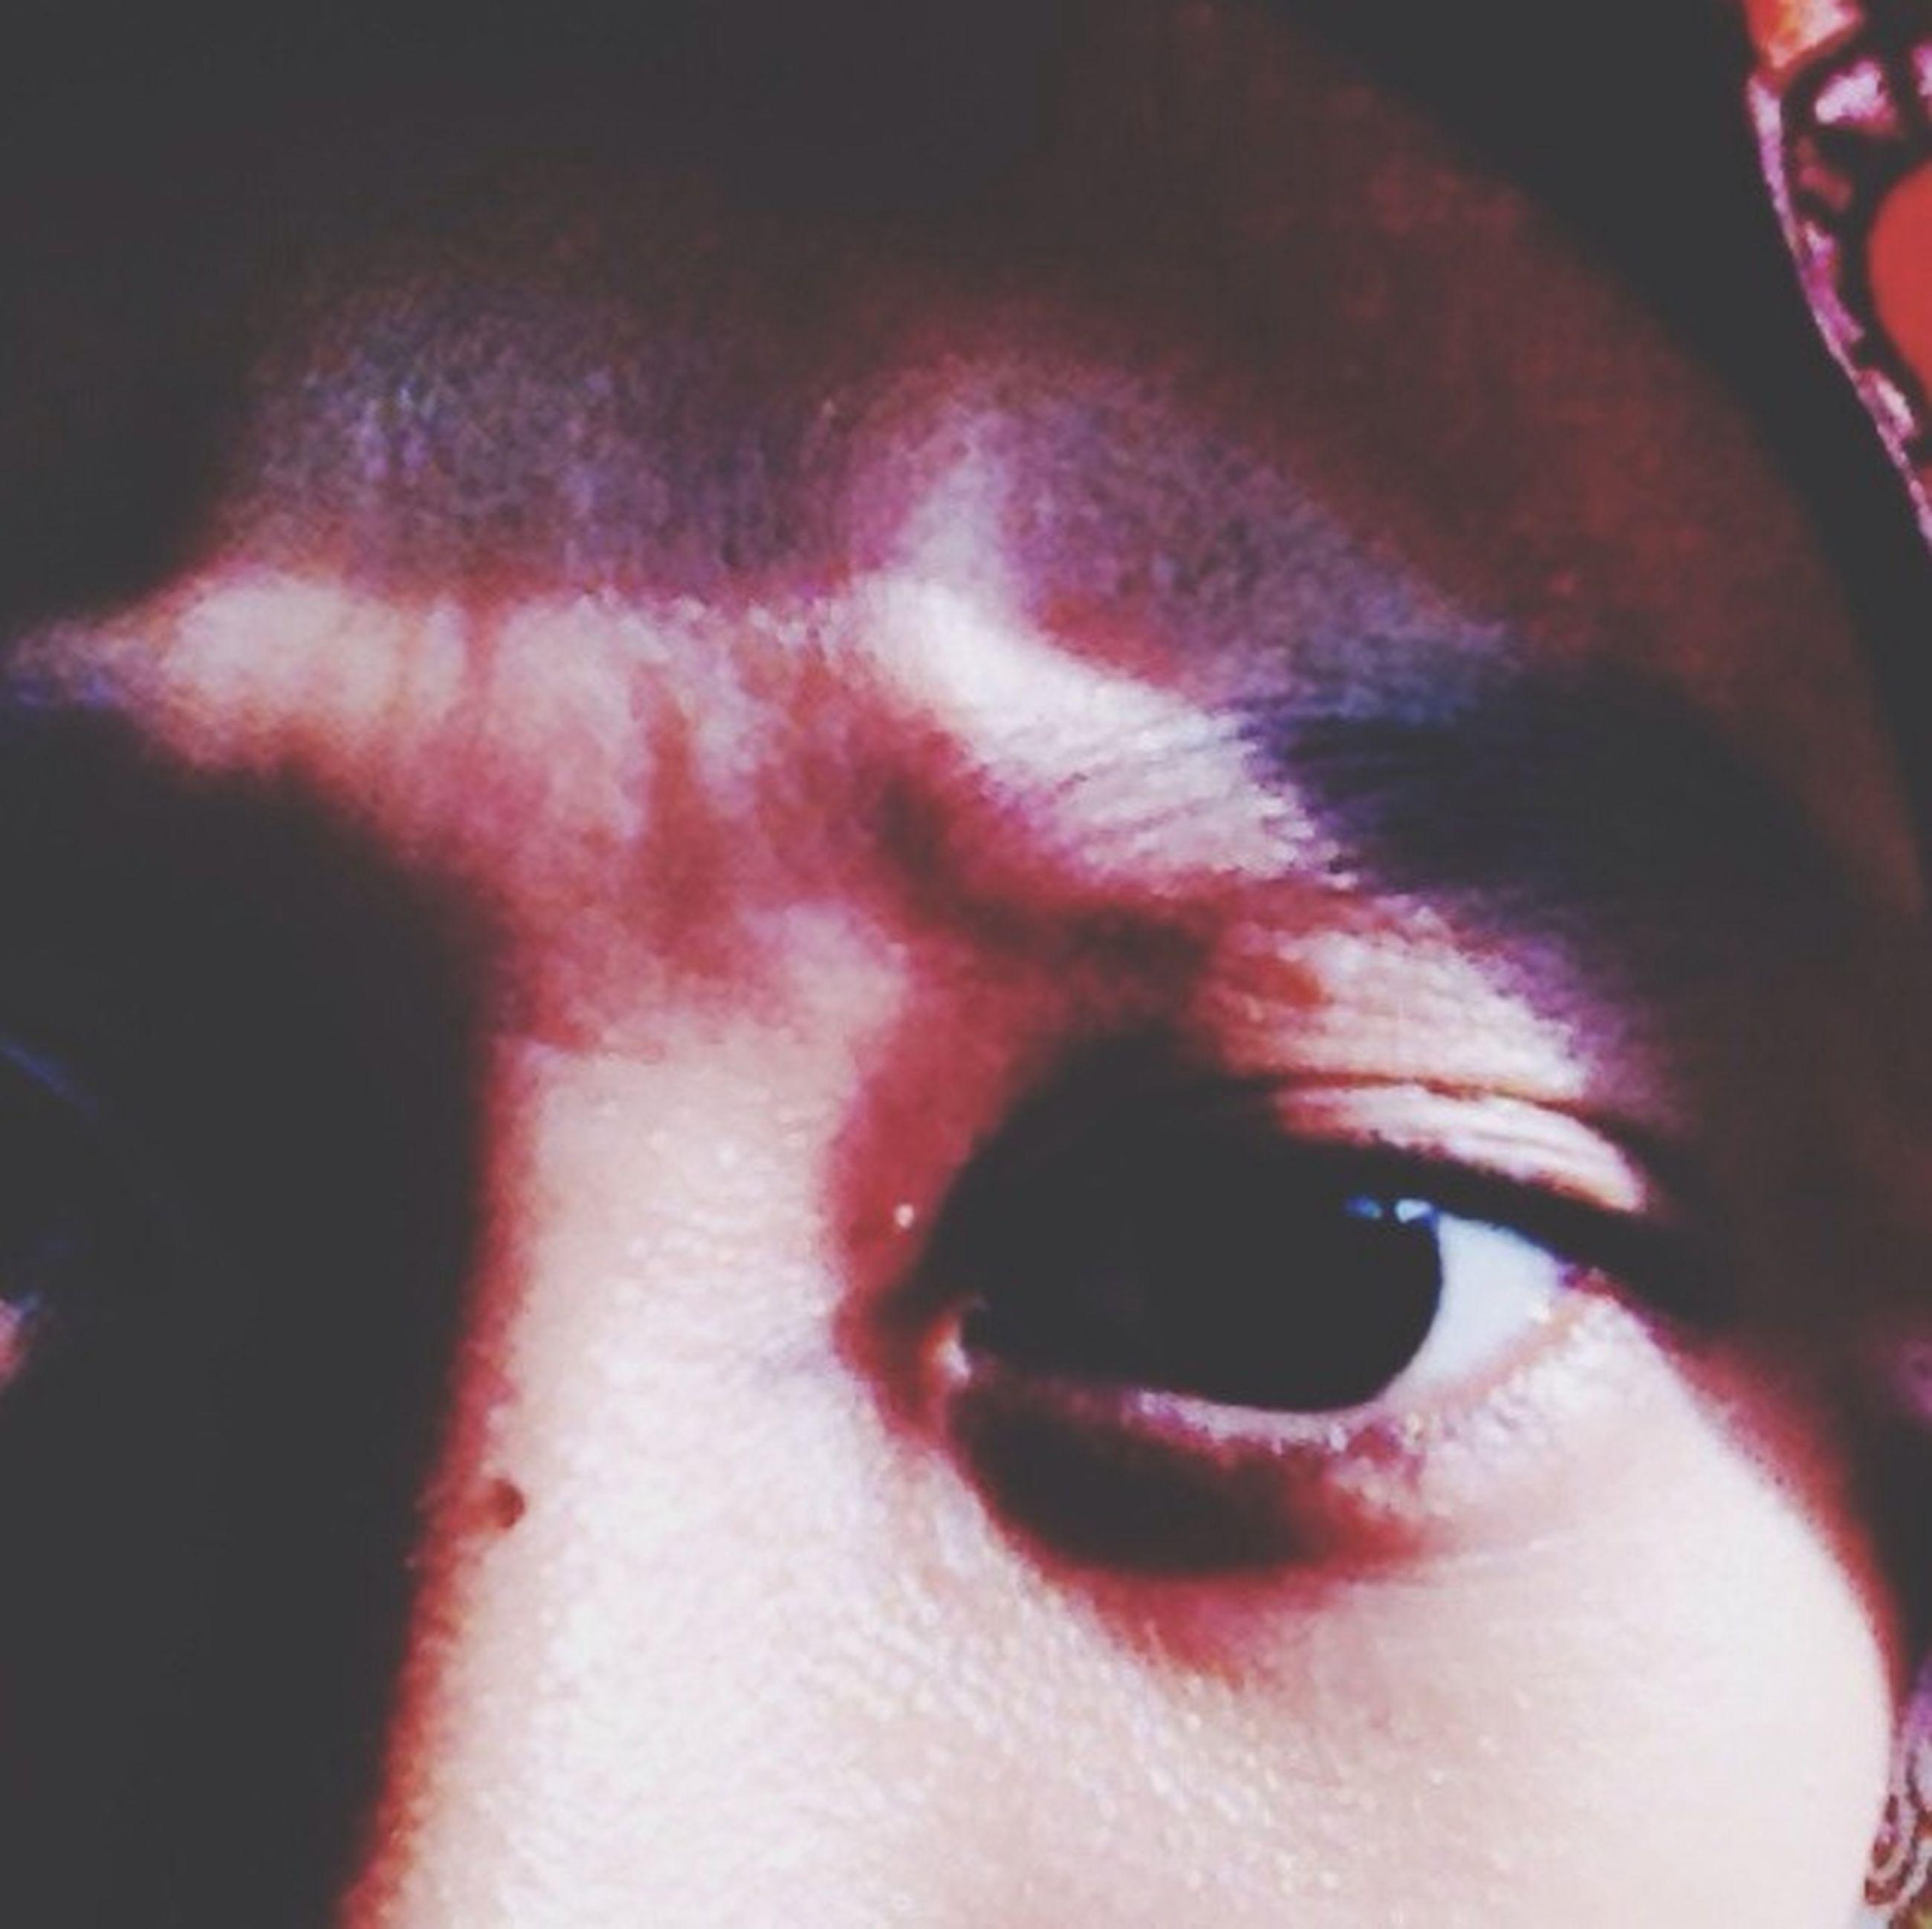 close-up, part of, human eye, eyelash, human face, human skin, extreme close up, headshot, extreme close-up, lifestyles, person, eyesight, cropped, portrait, looking at camera, studio shot, sensory perception